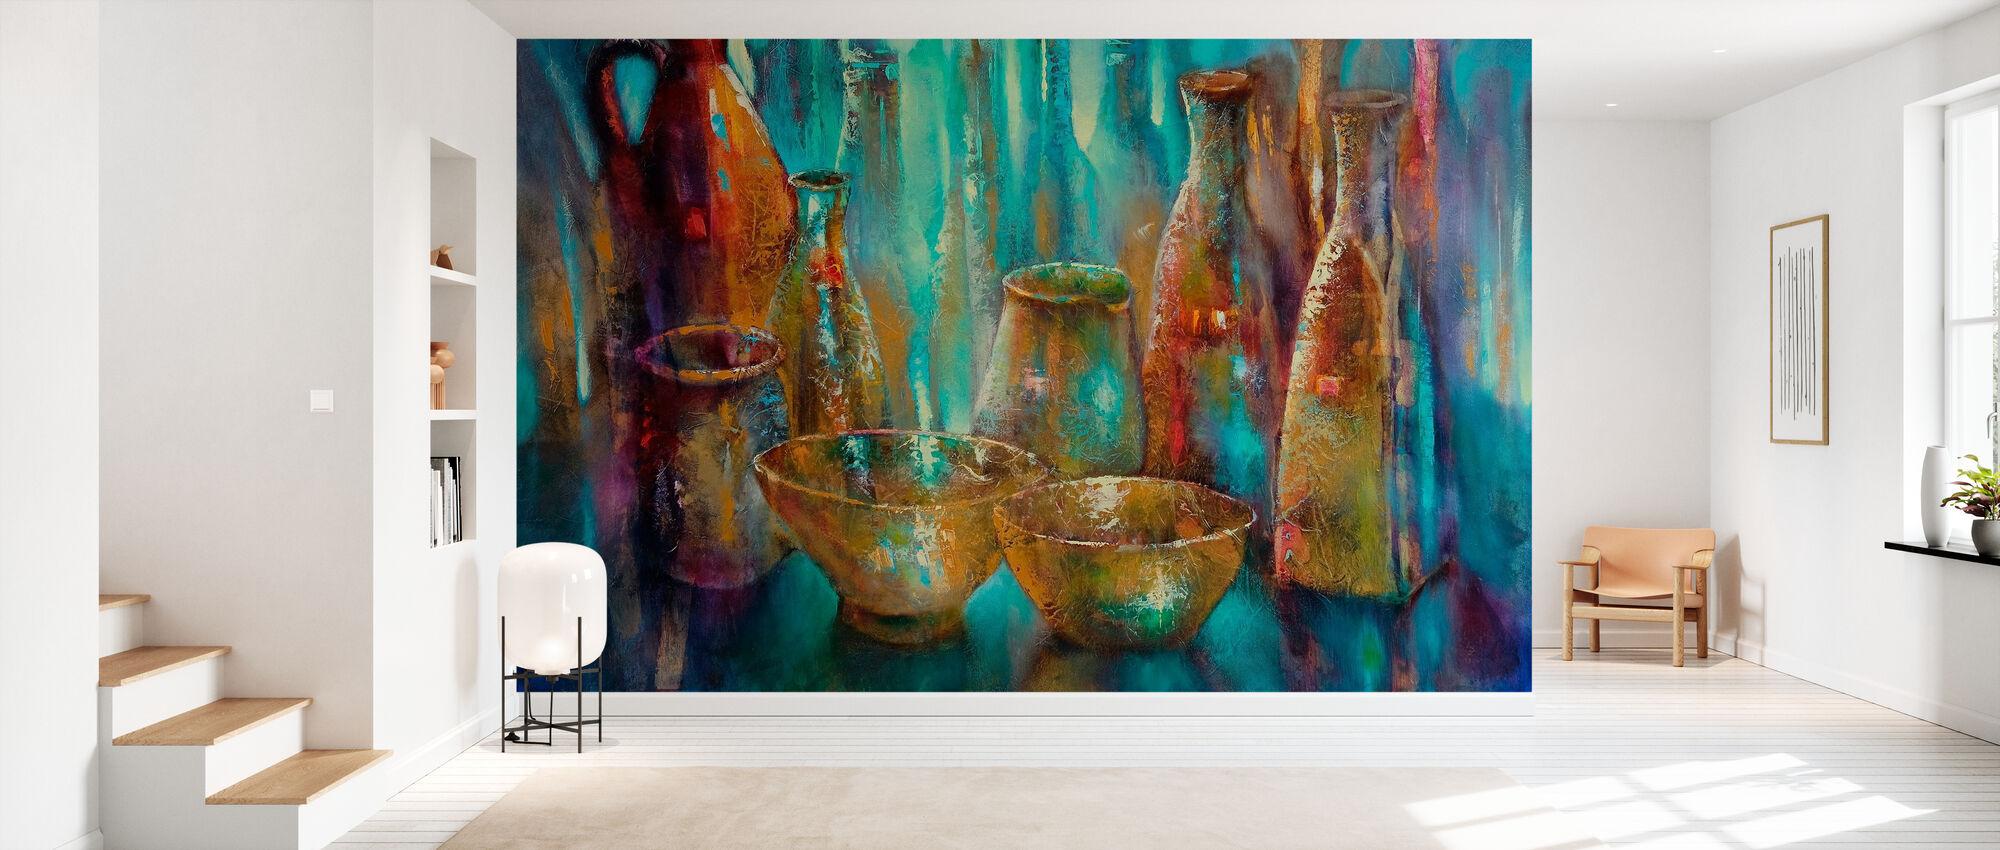 Two Golden Bowls - Wallpaper - Hallway